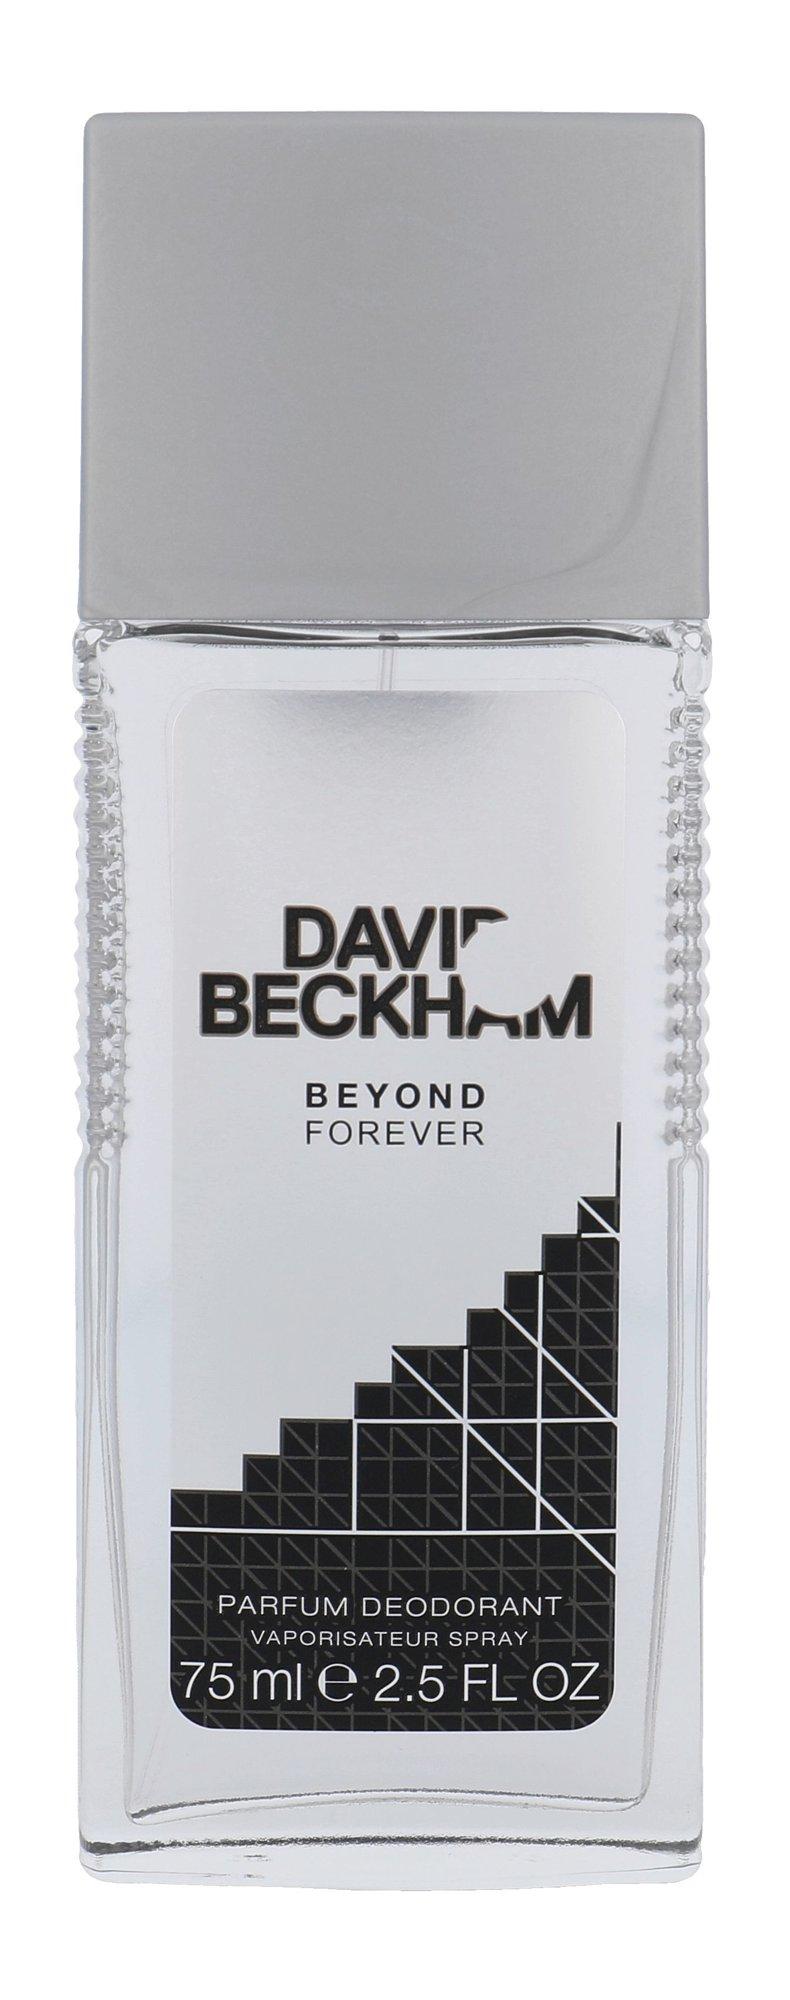 David Beckham Beyond Forever Deodorant 75ml